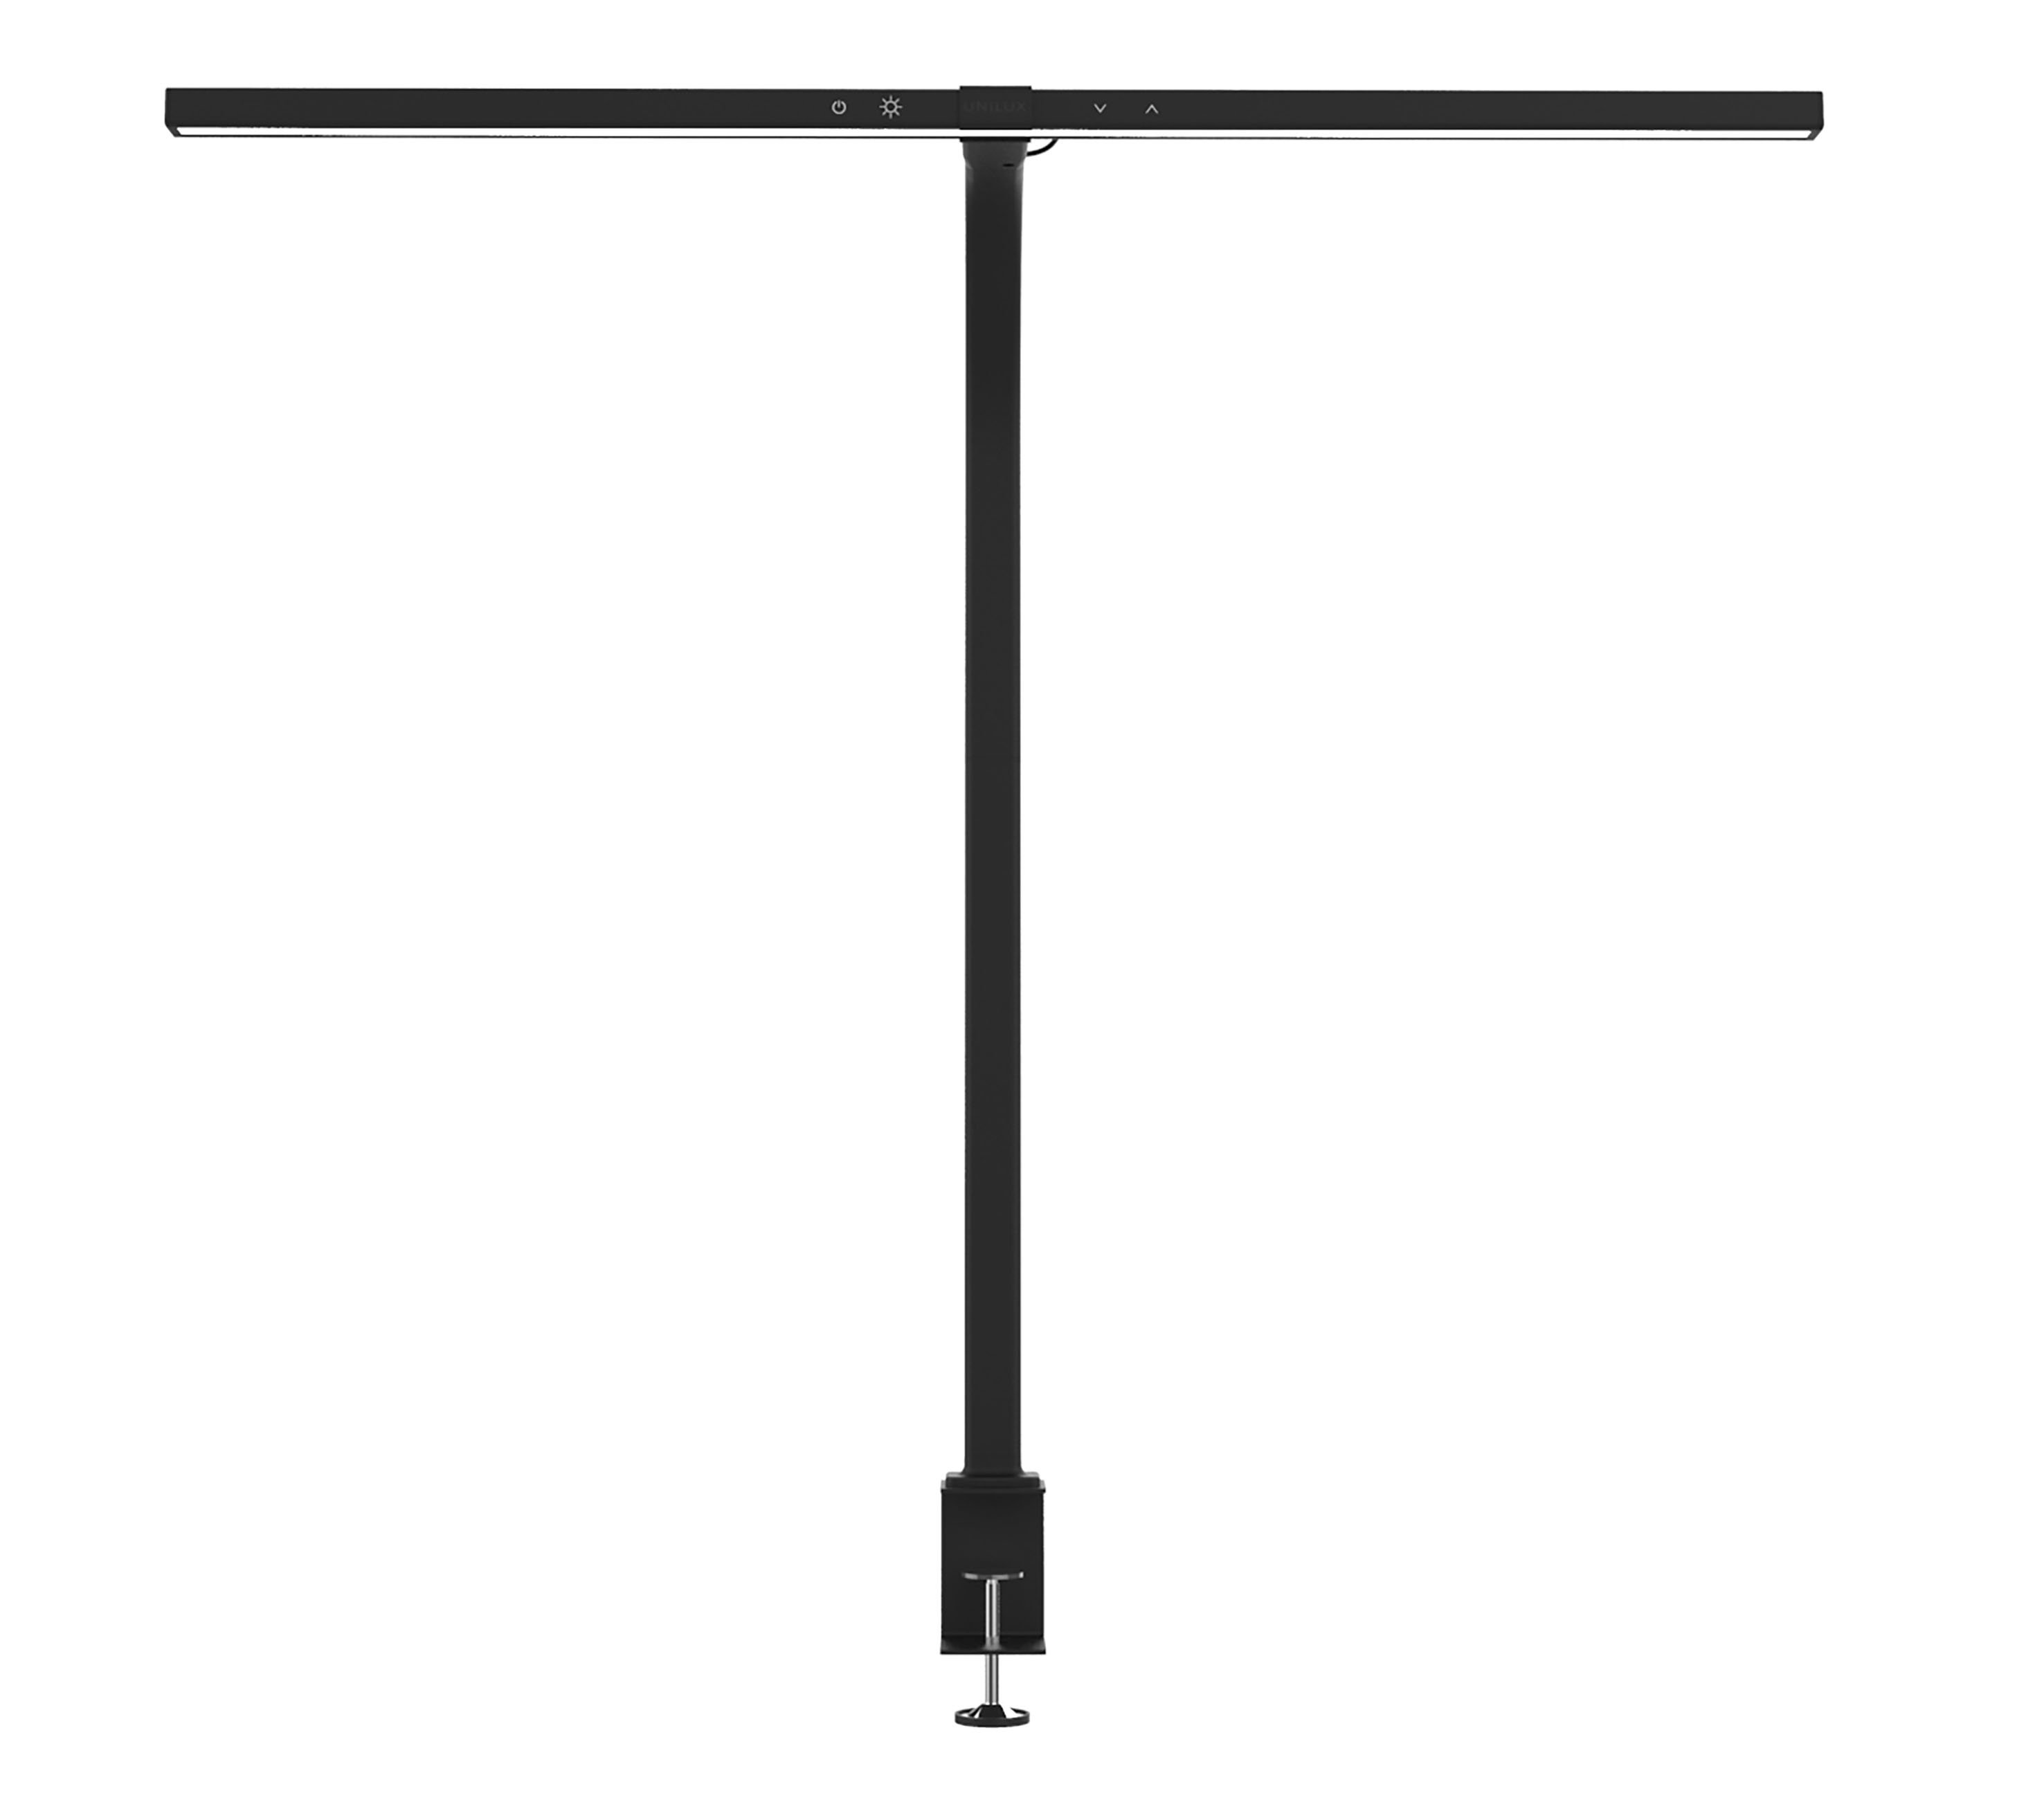 Pöytävalaisin Strata LED, musta